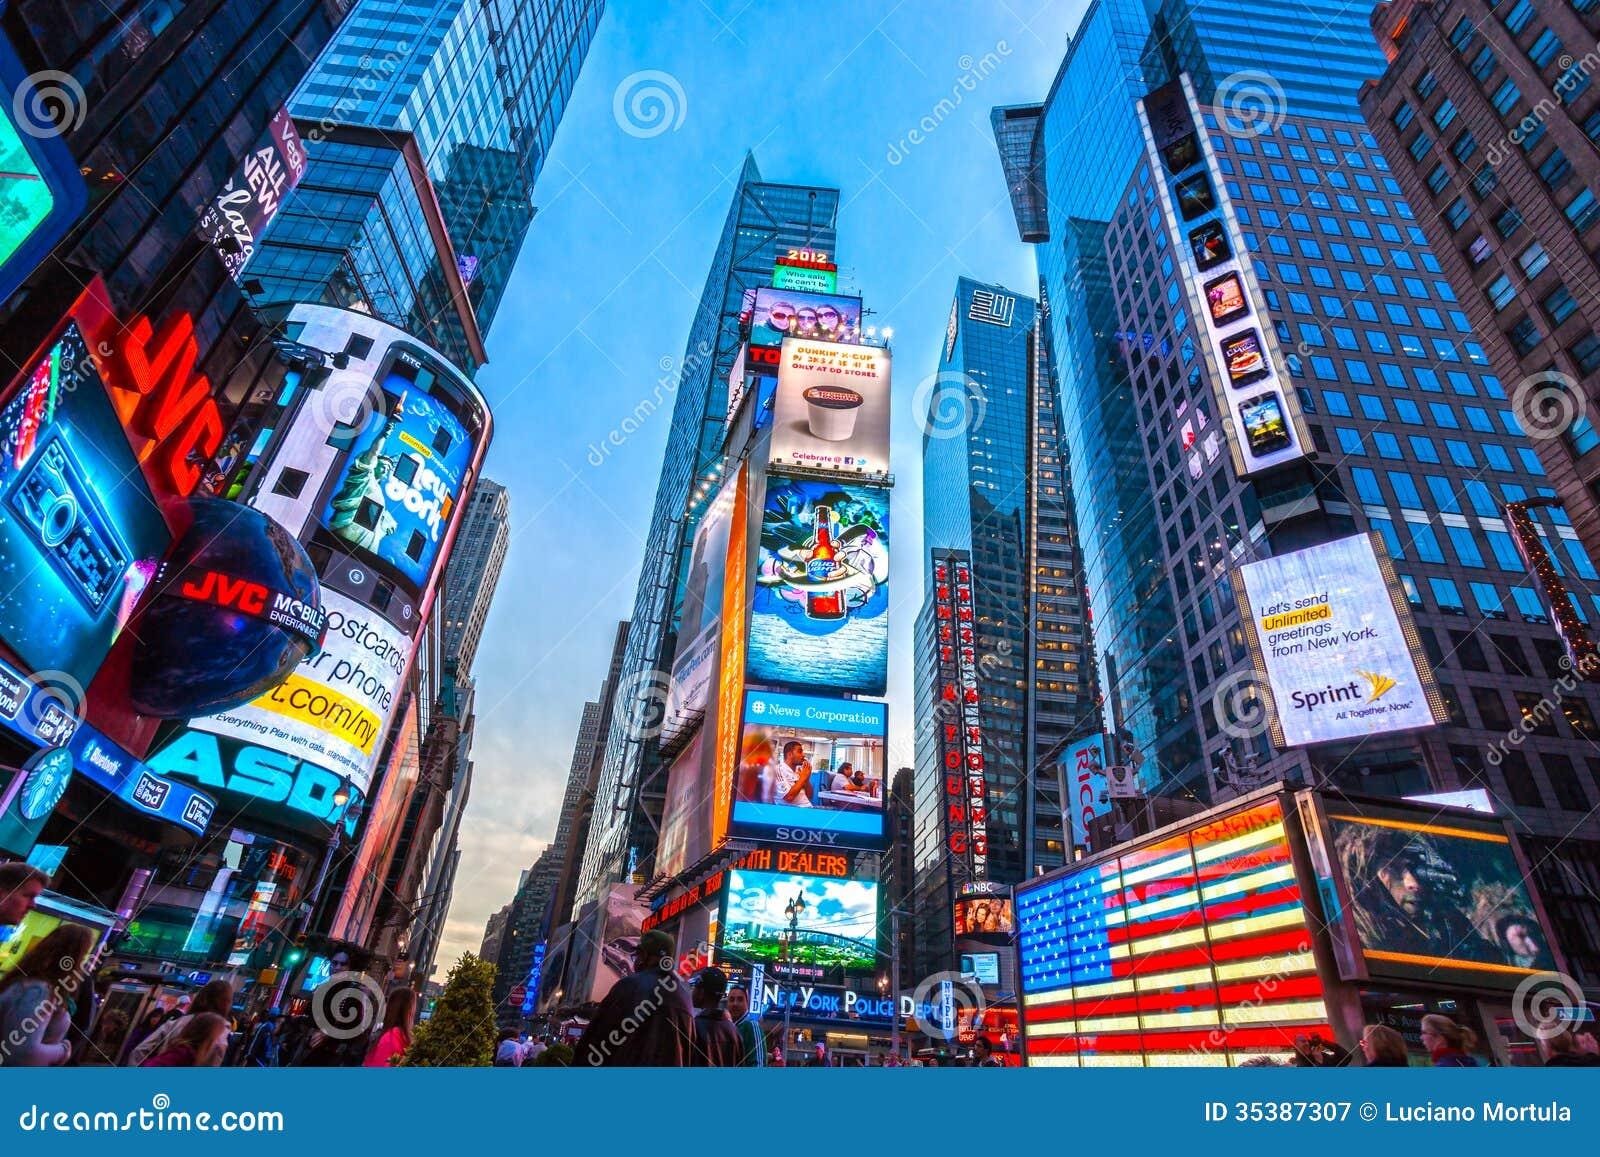 Таймс площадь, Нью-Йорк